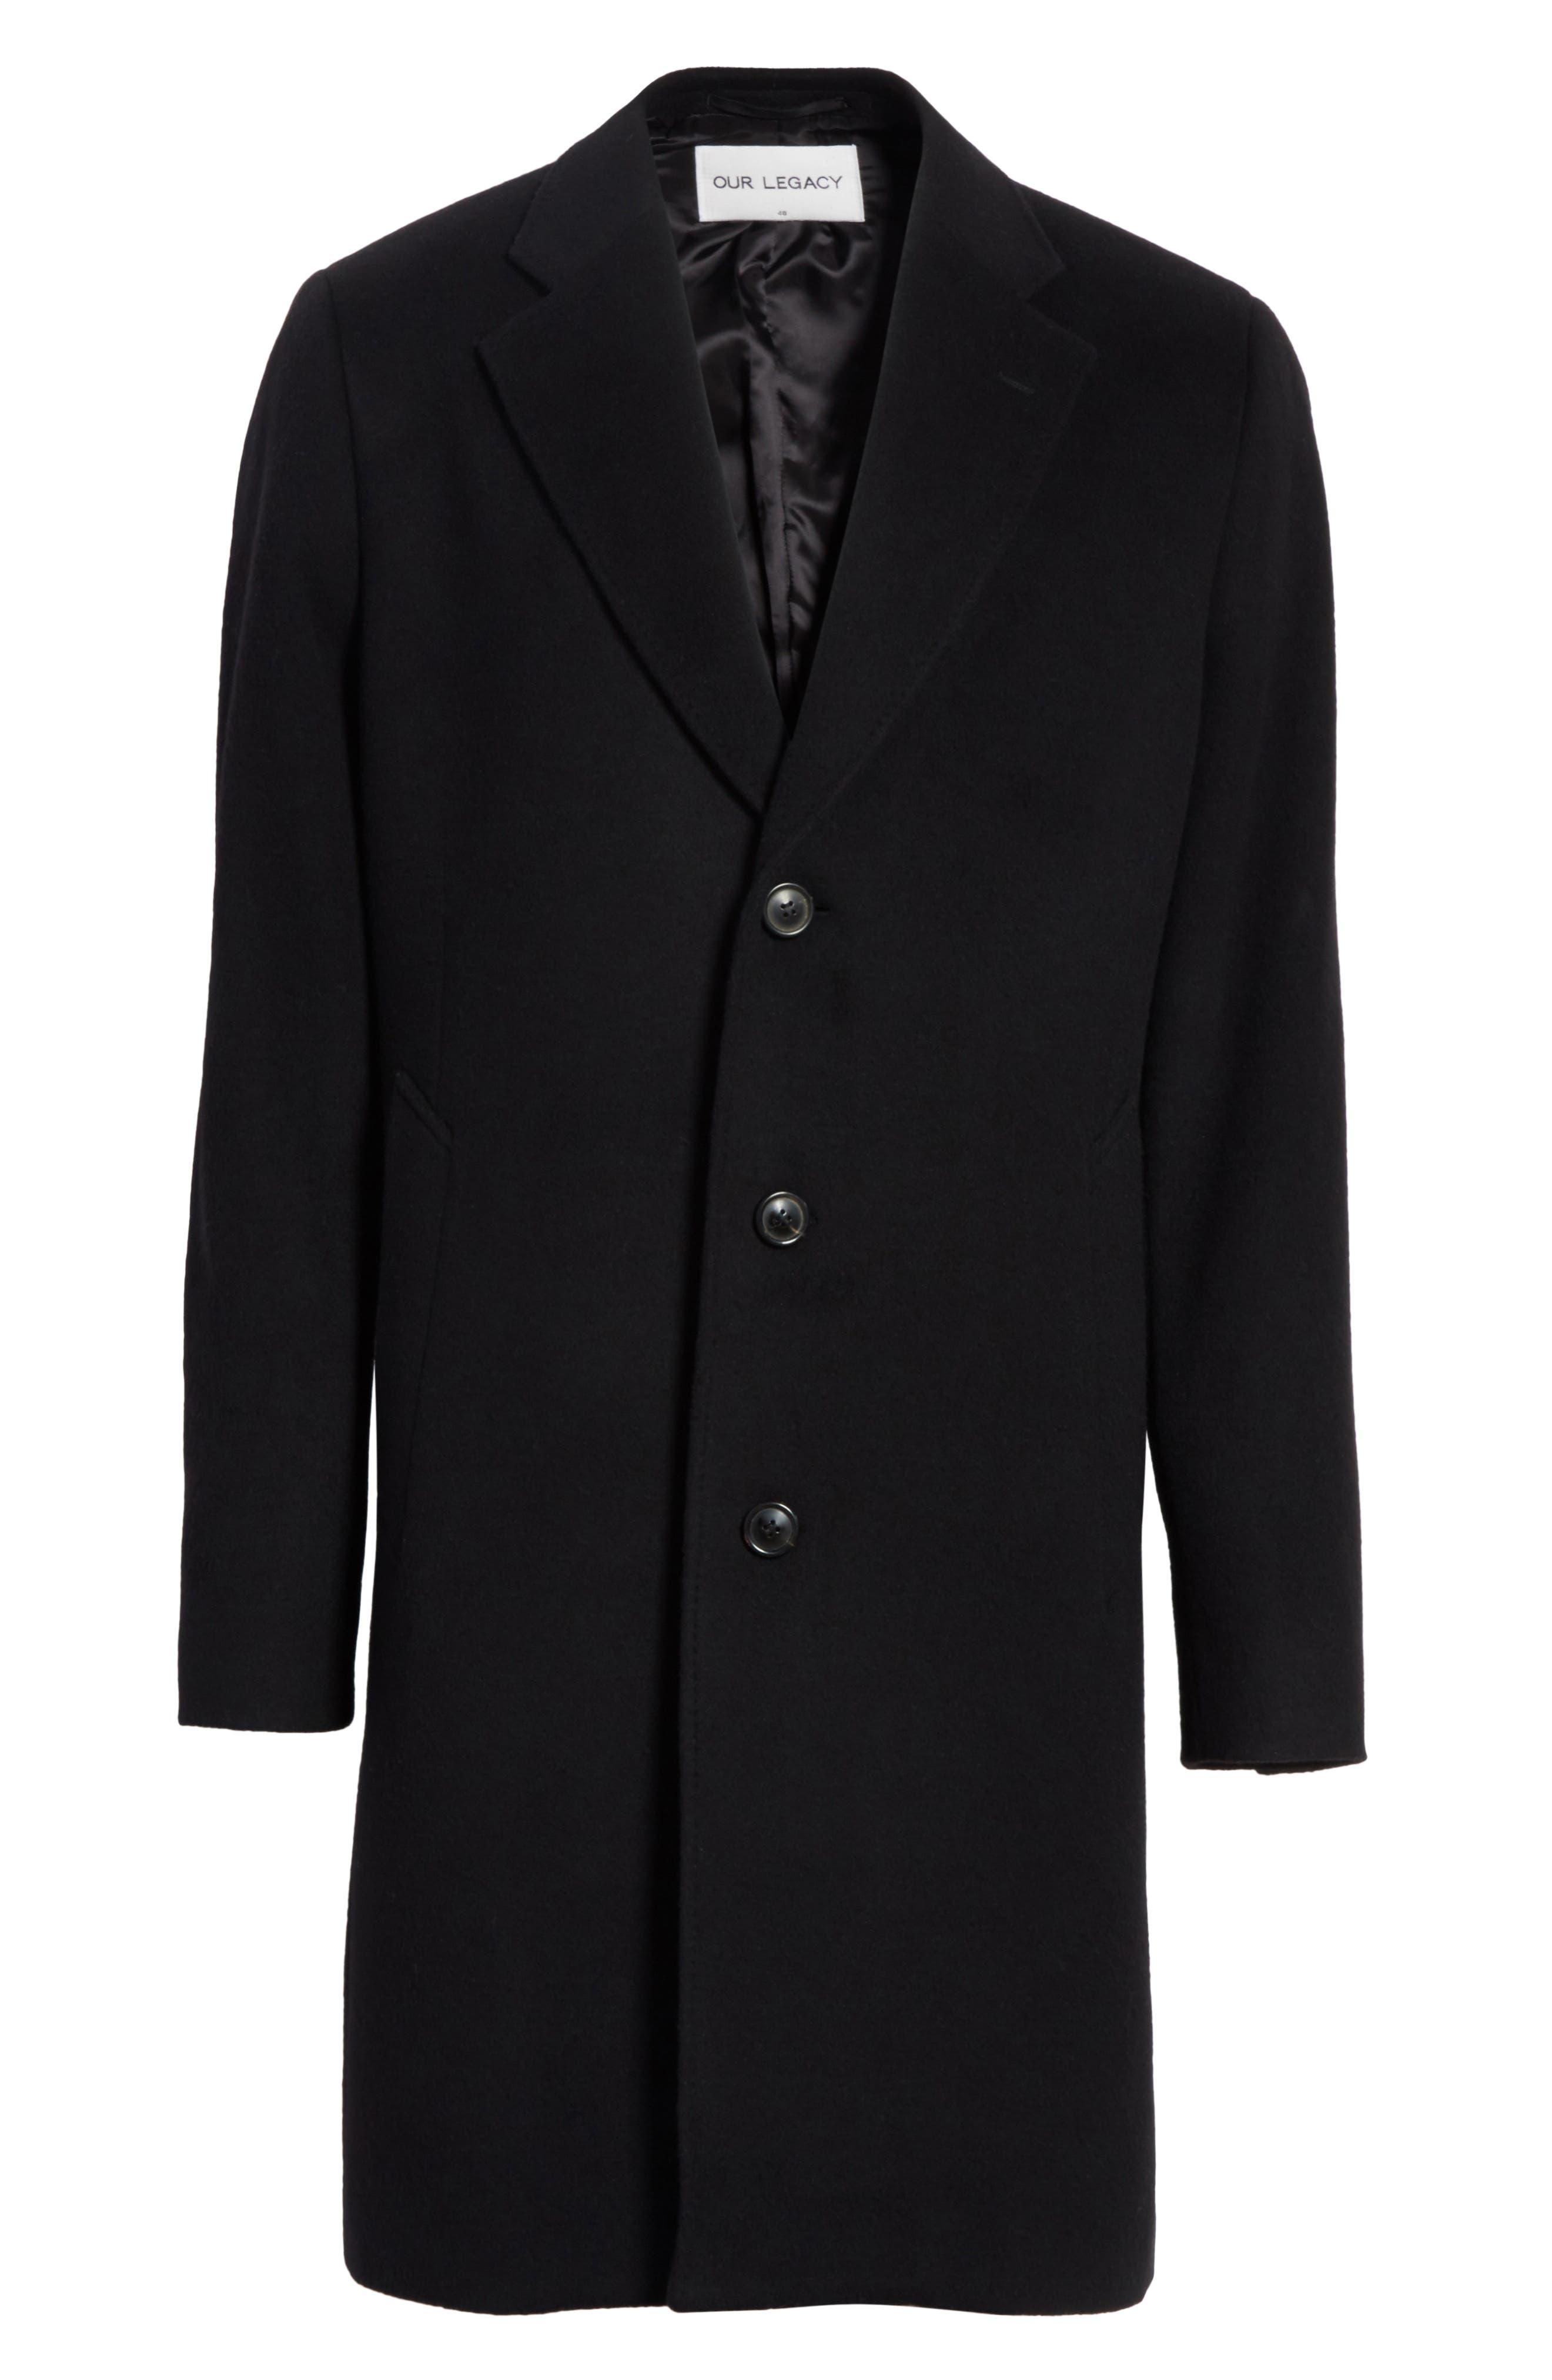 Wool & Cashmere Car Coat,                             Alternate thumbnail 5, color,                             001